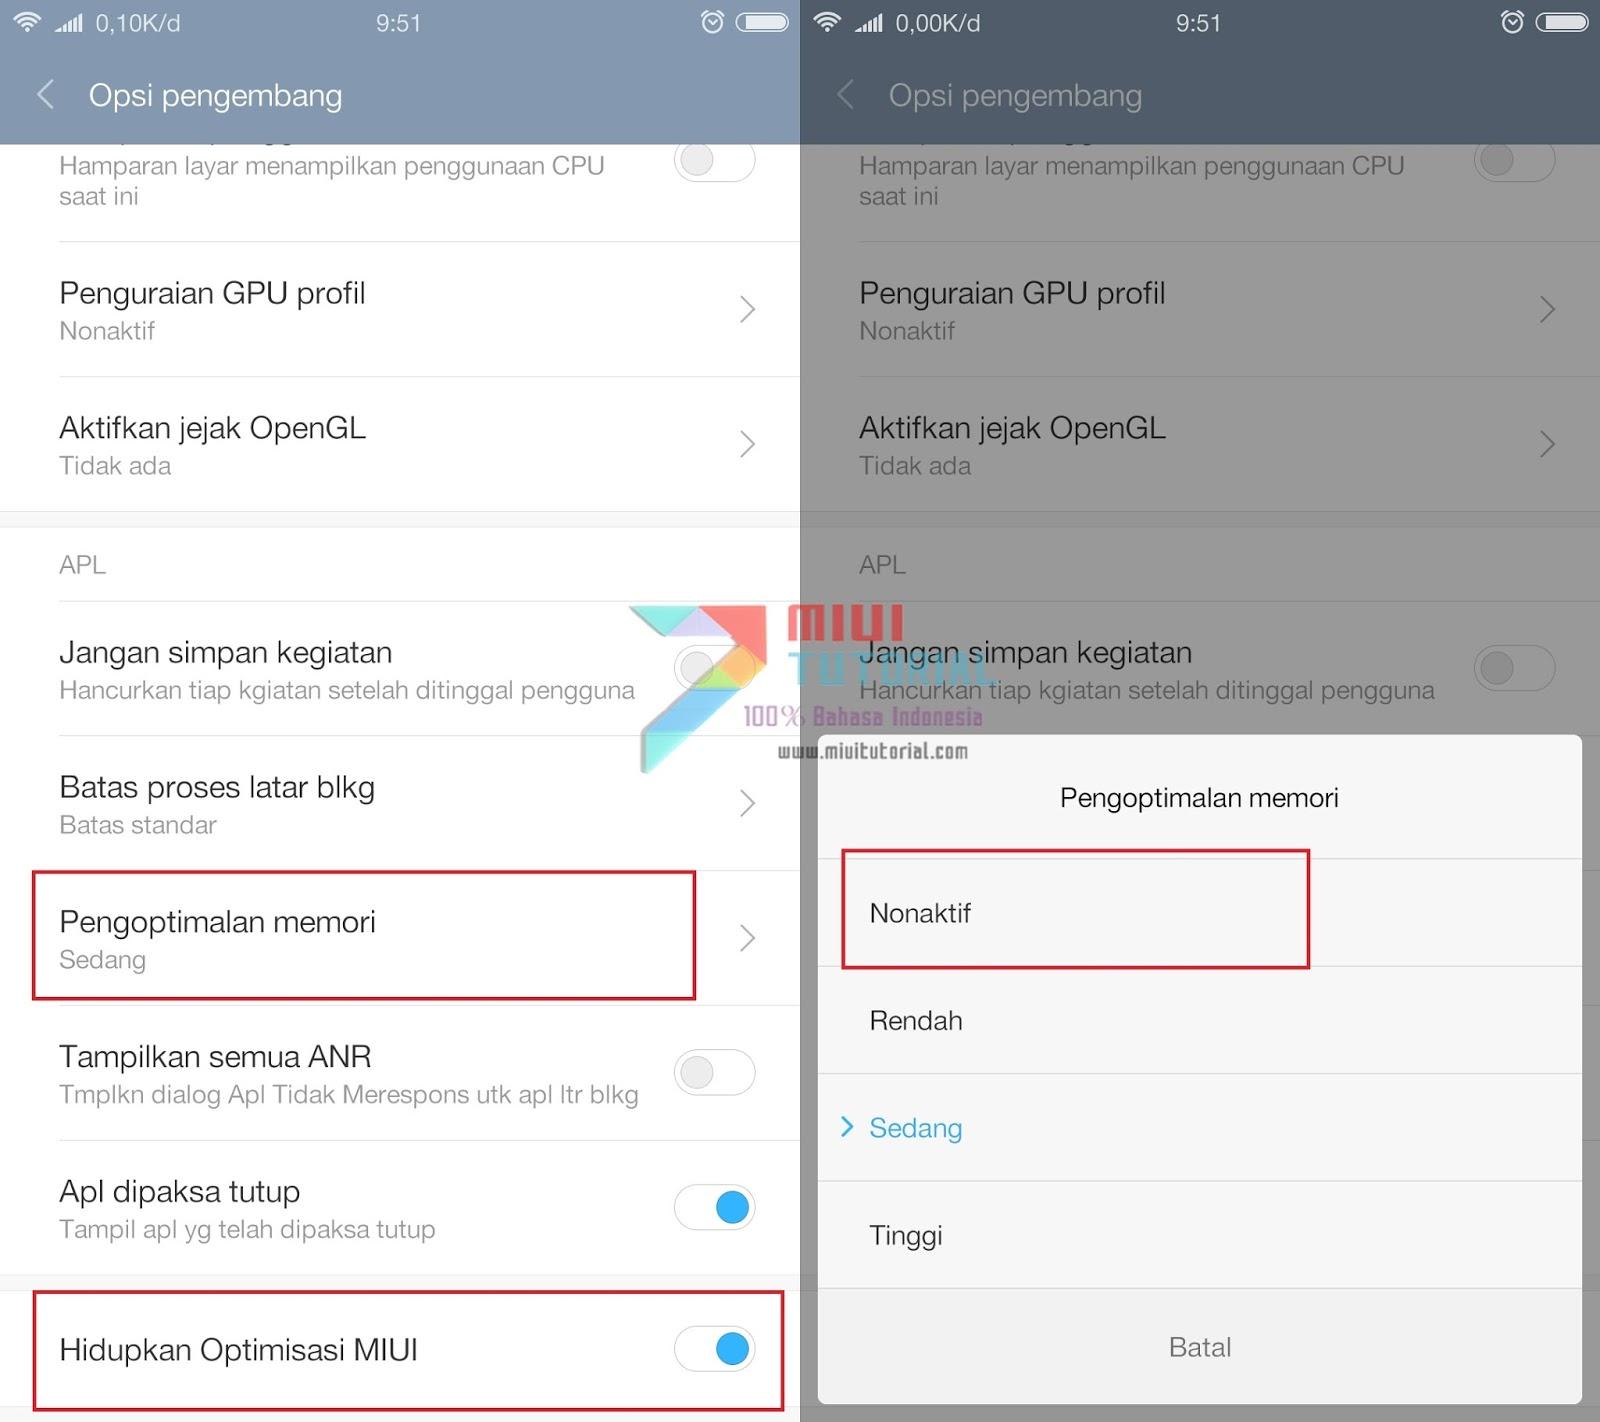 Mengoptimalkan Ferporma Baterai dan Miui - Tips dan trik - Mi Community - Xiaomi